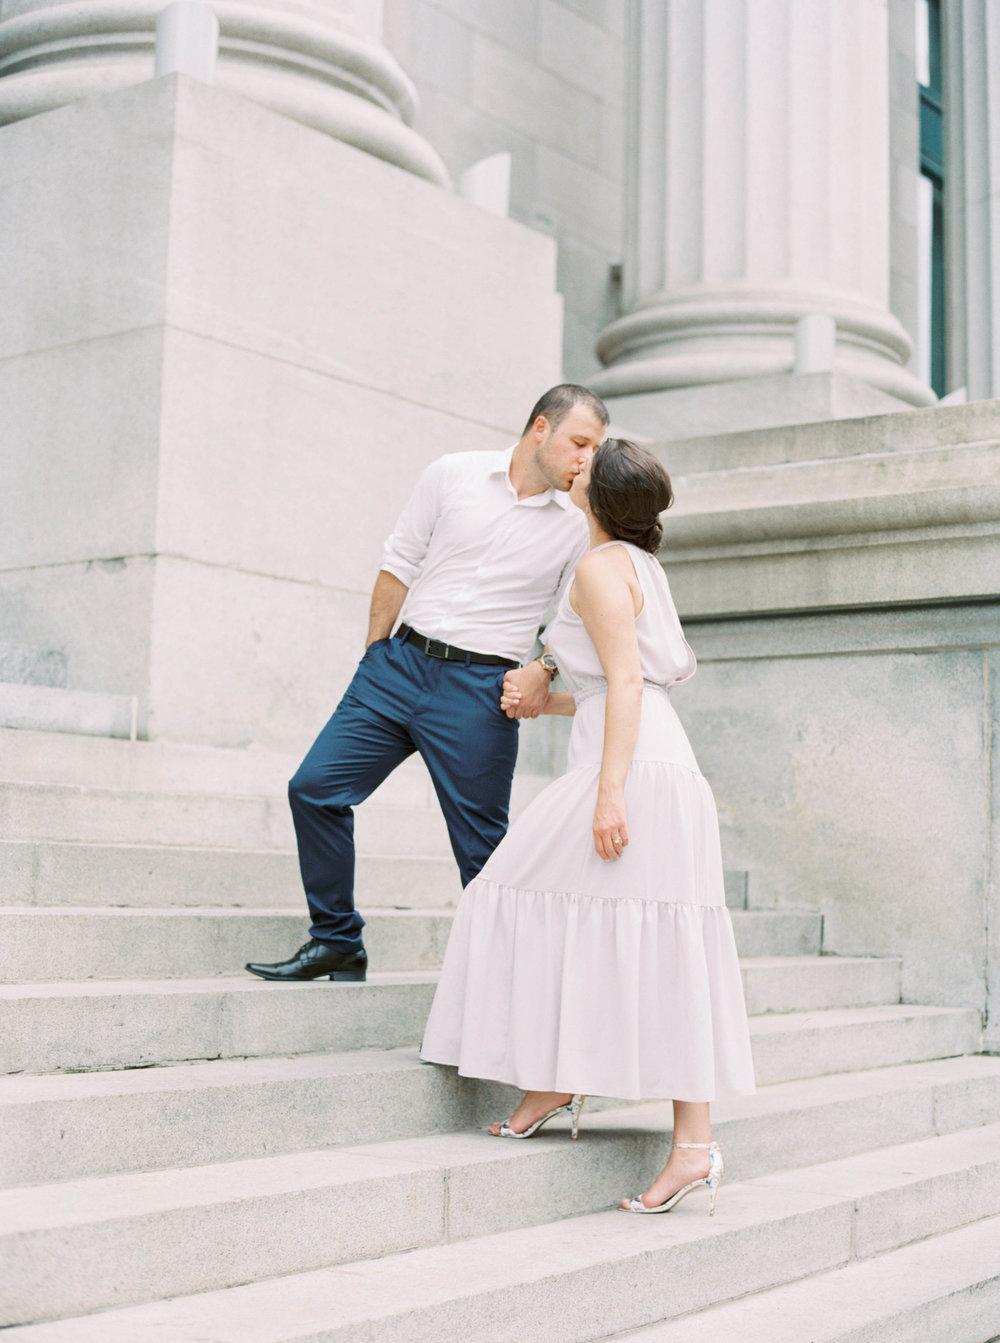 montreal-wedding-photographer-soft-airy-kurtz-toronto-marcia-shpati-187.jpg